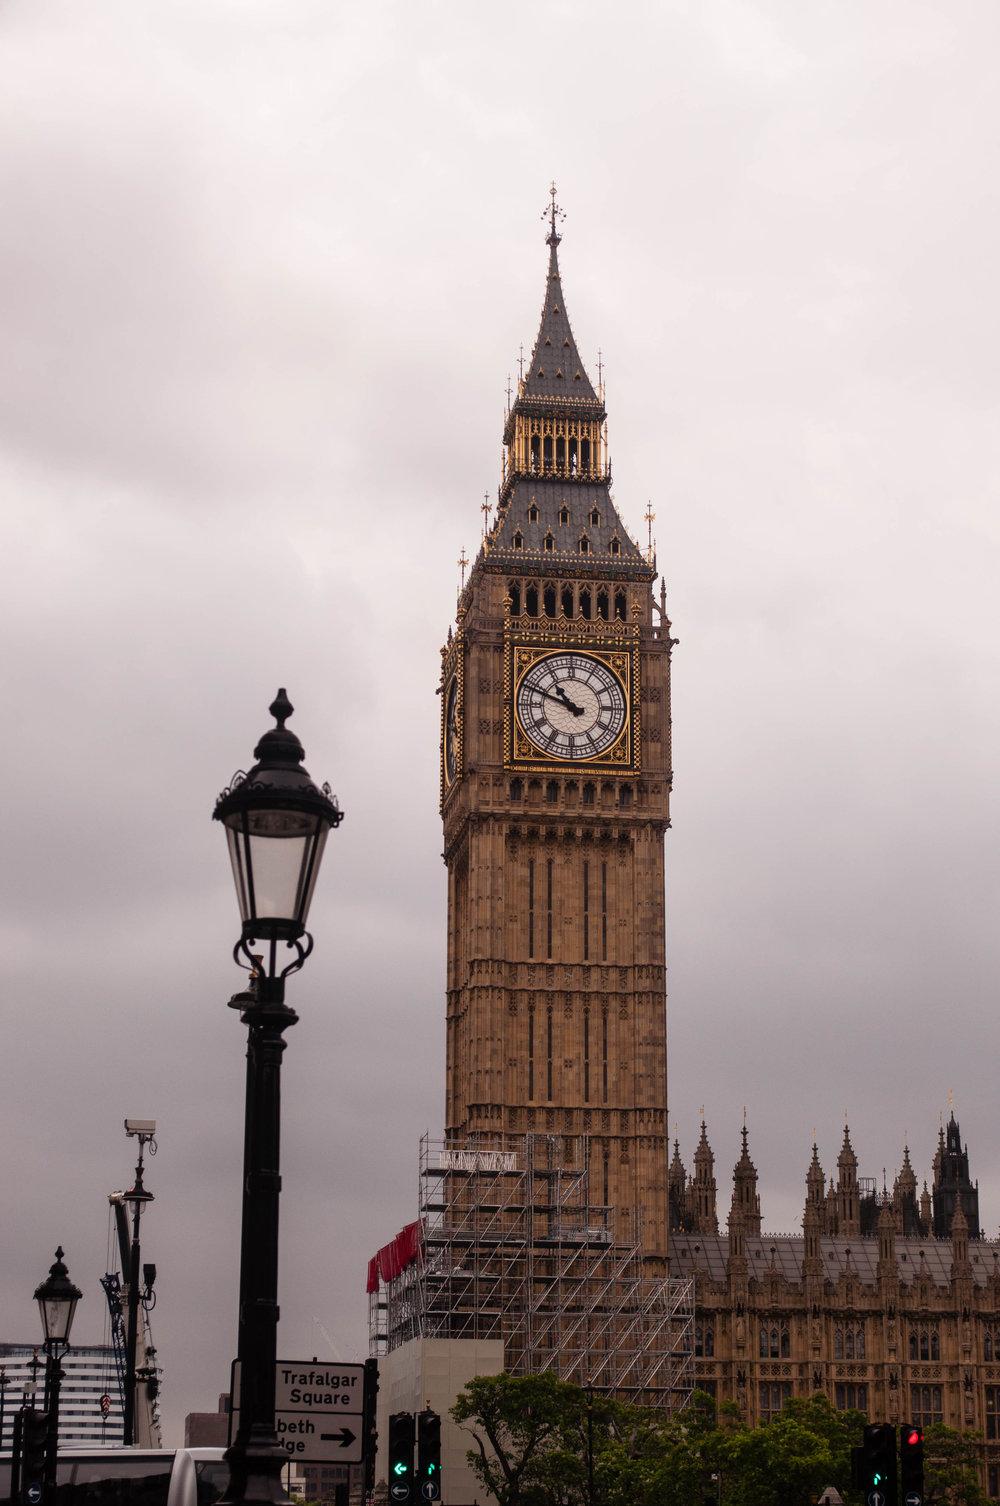 Layover in London, Big Ben